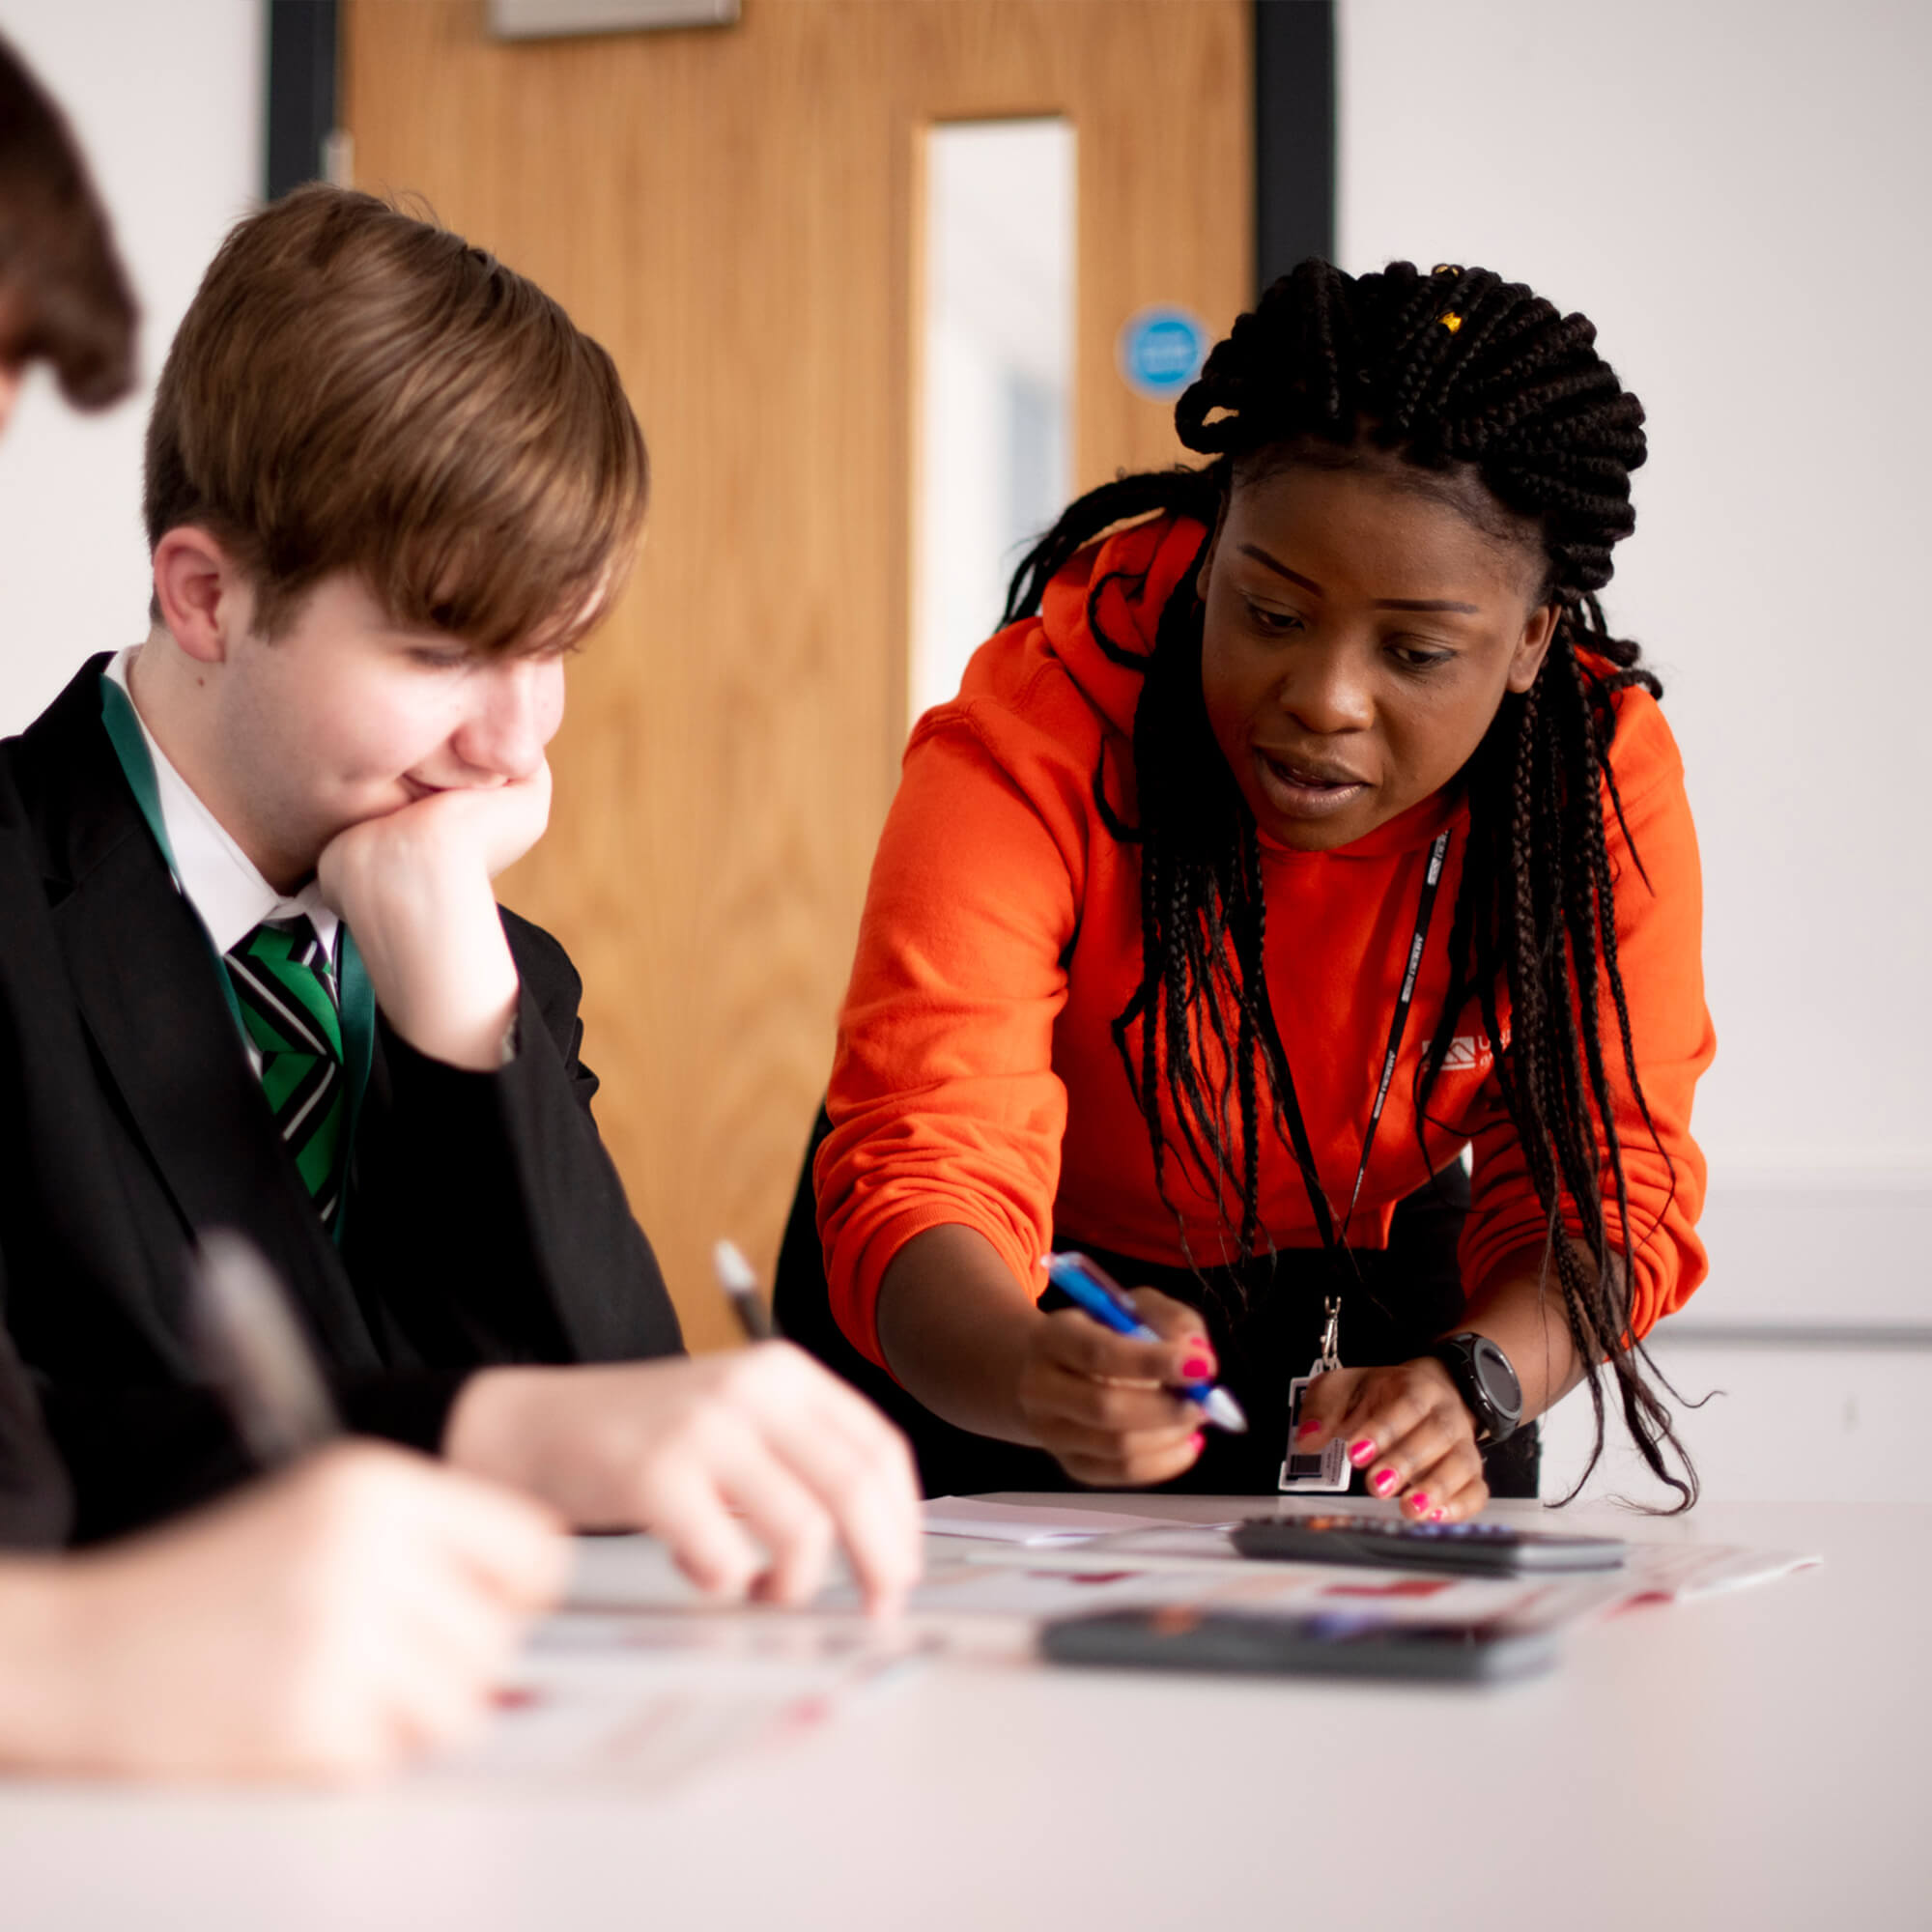 Teaching in a classroom setting